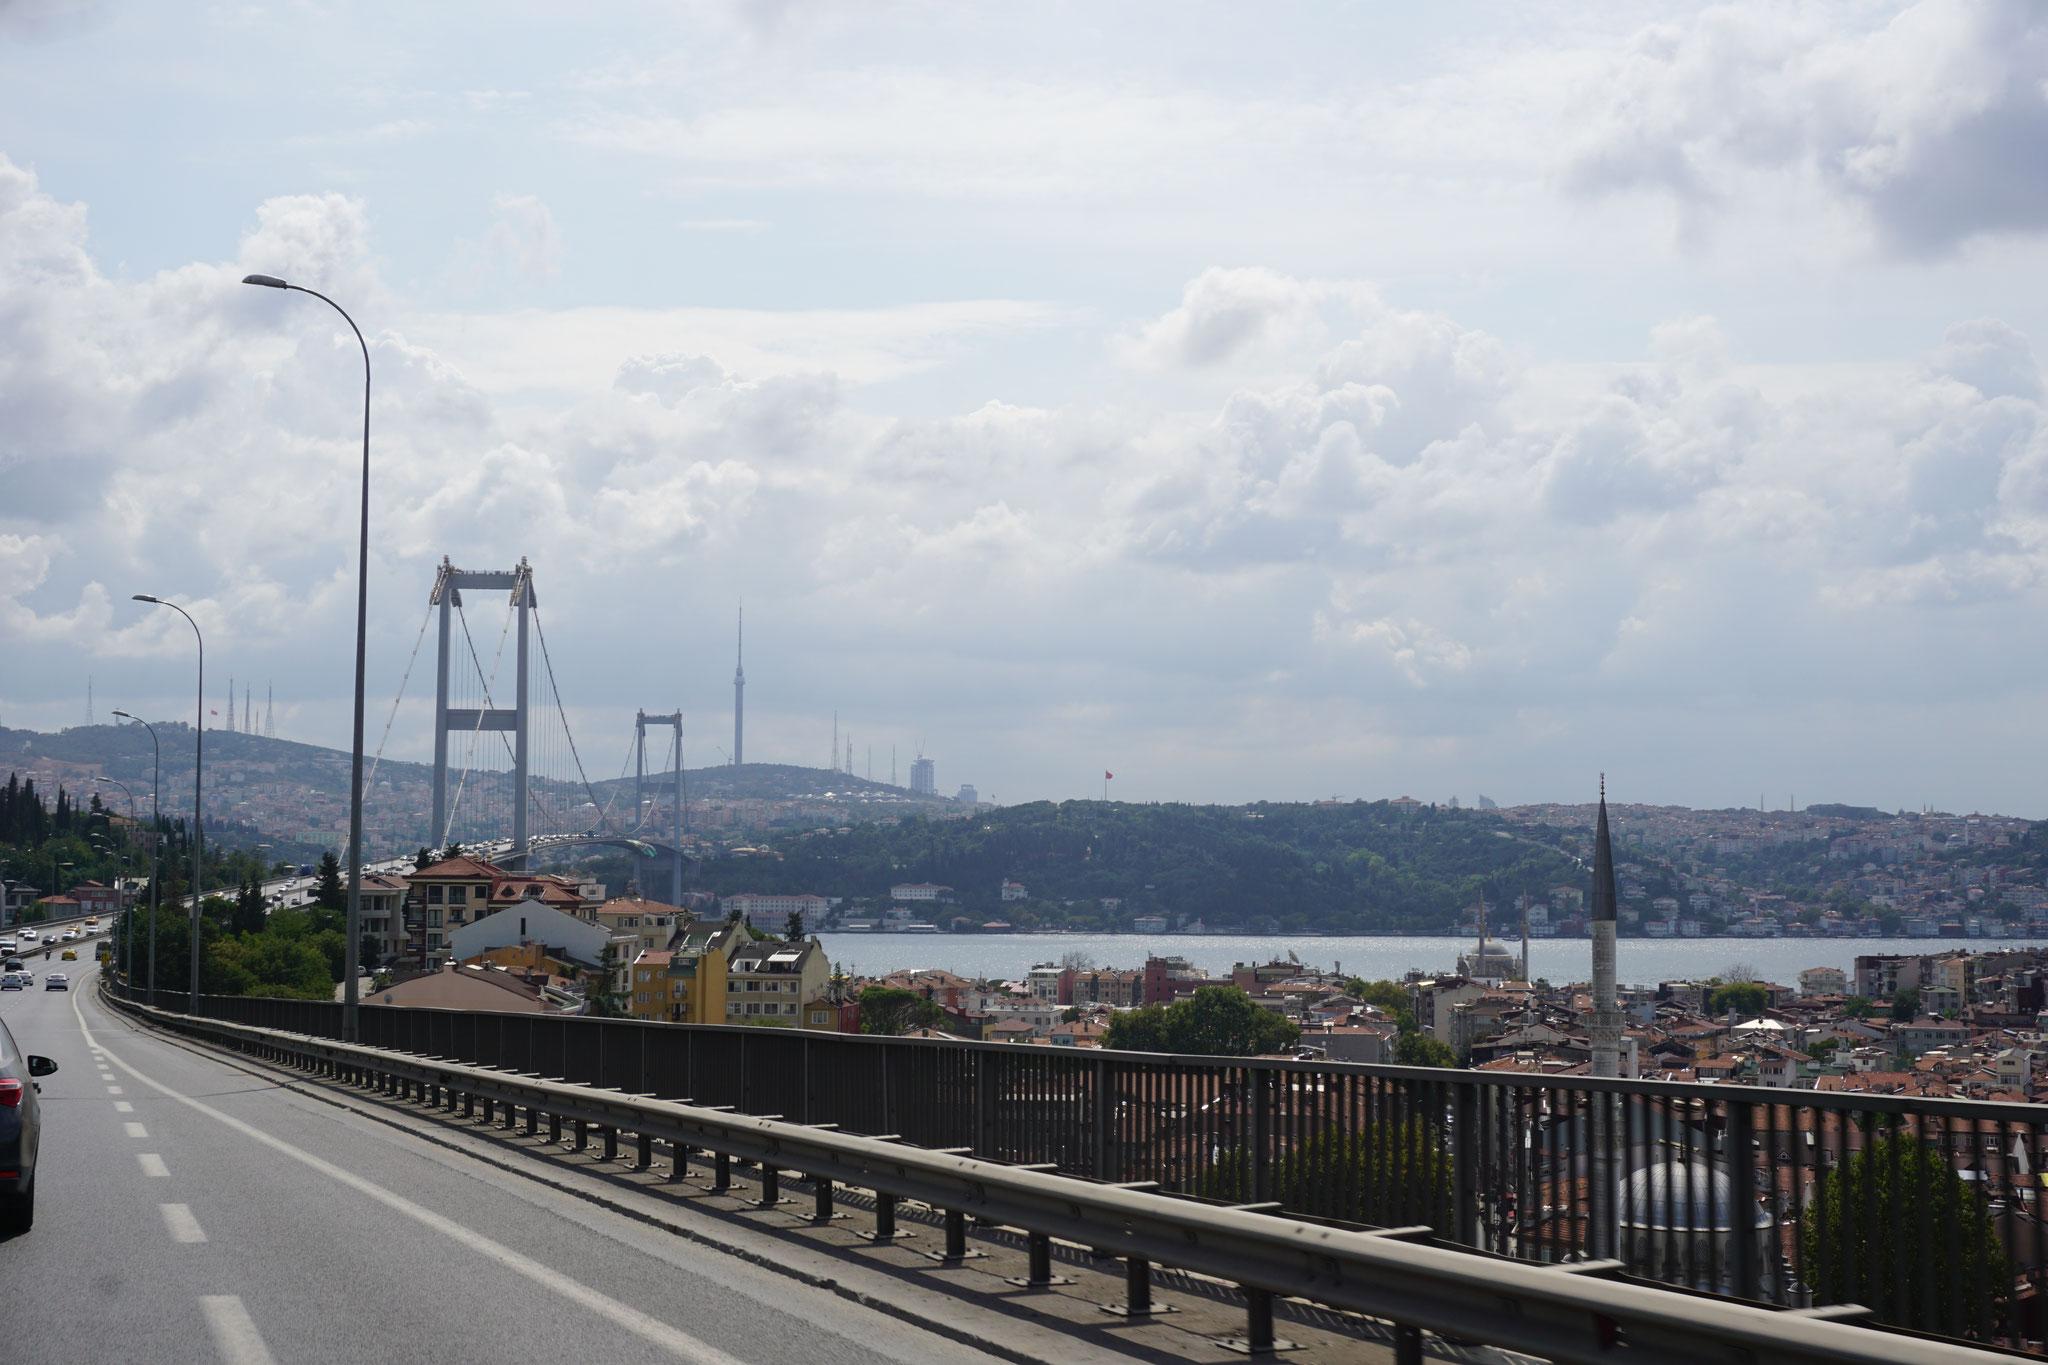 Daar issie dan; de Bosporus!